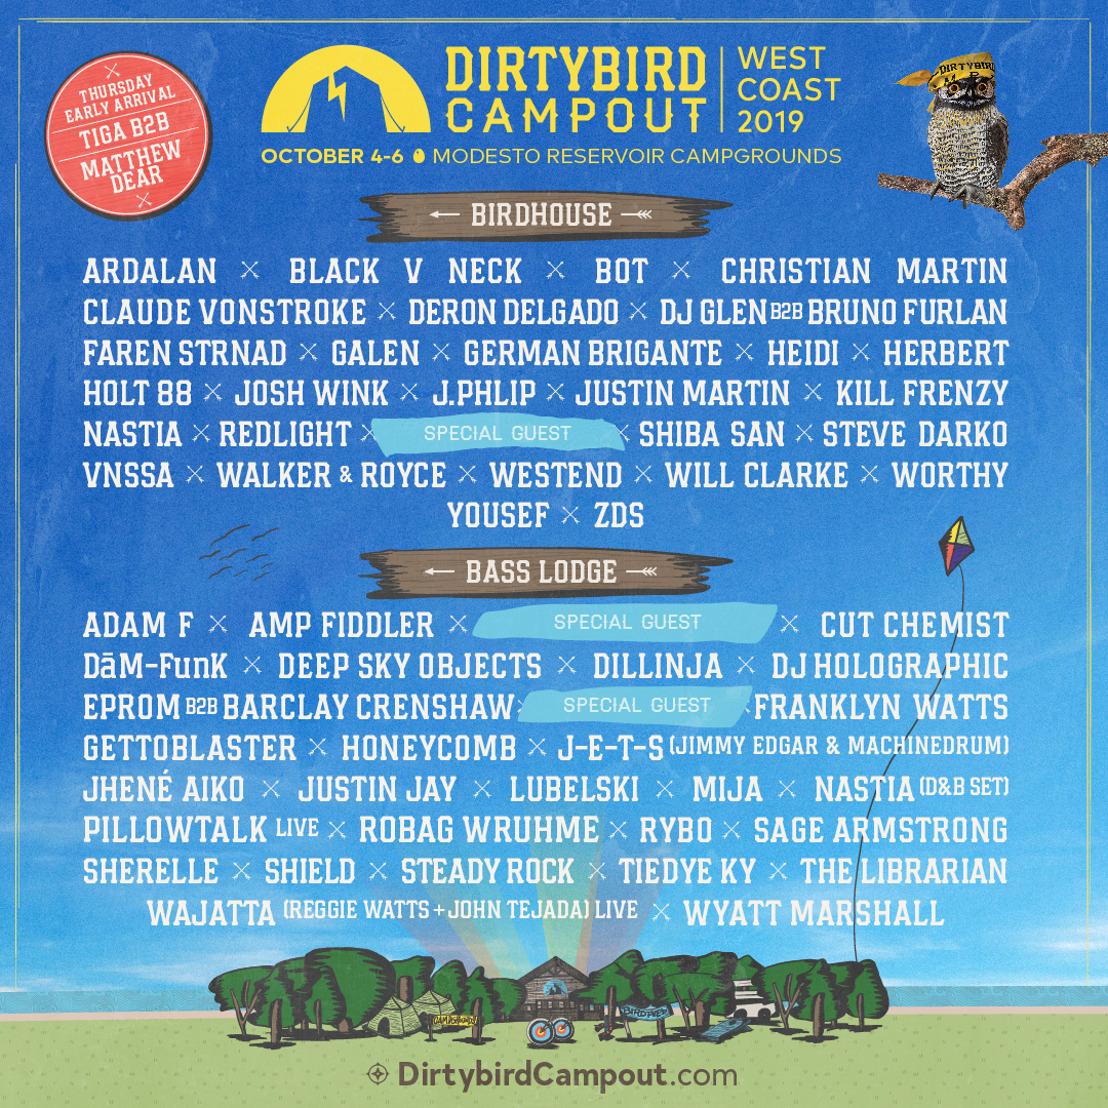 Dirtybird Campout Announces Lineup for 2019 West Coast Event